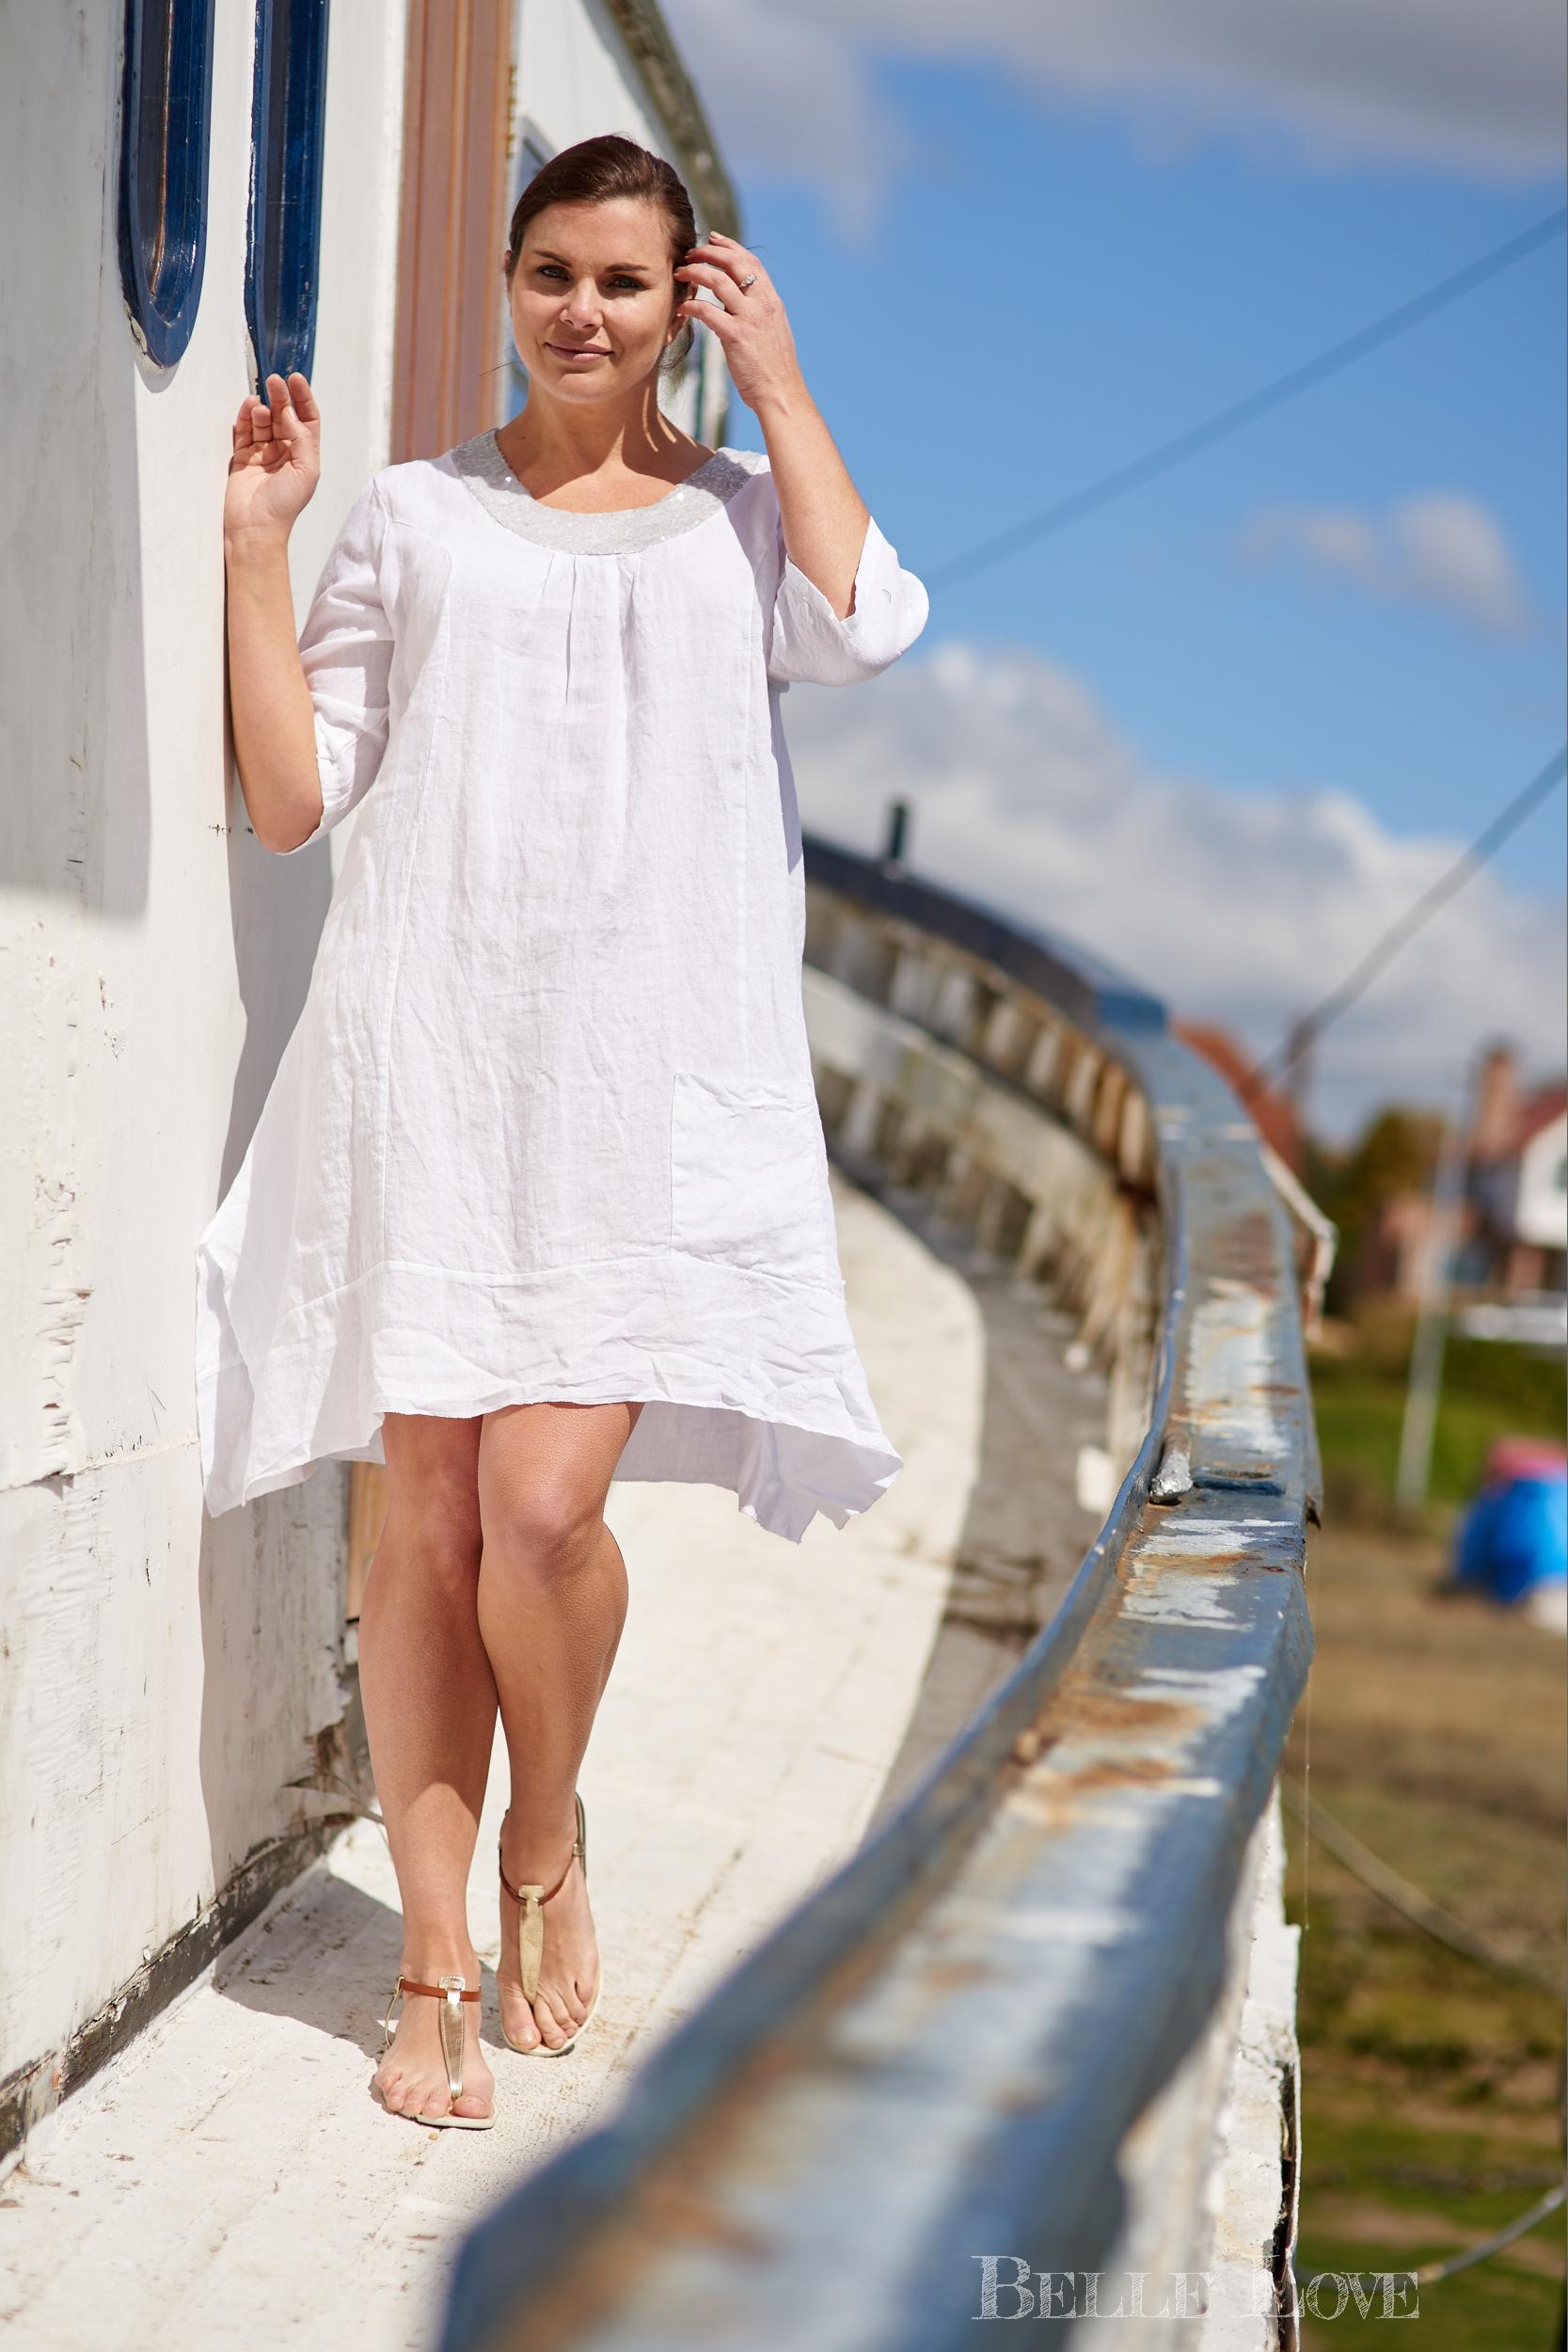 Belle Love Italy Sequin Linen Dress